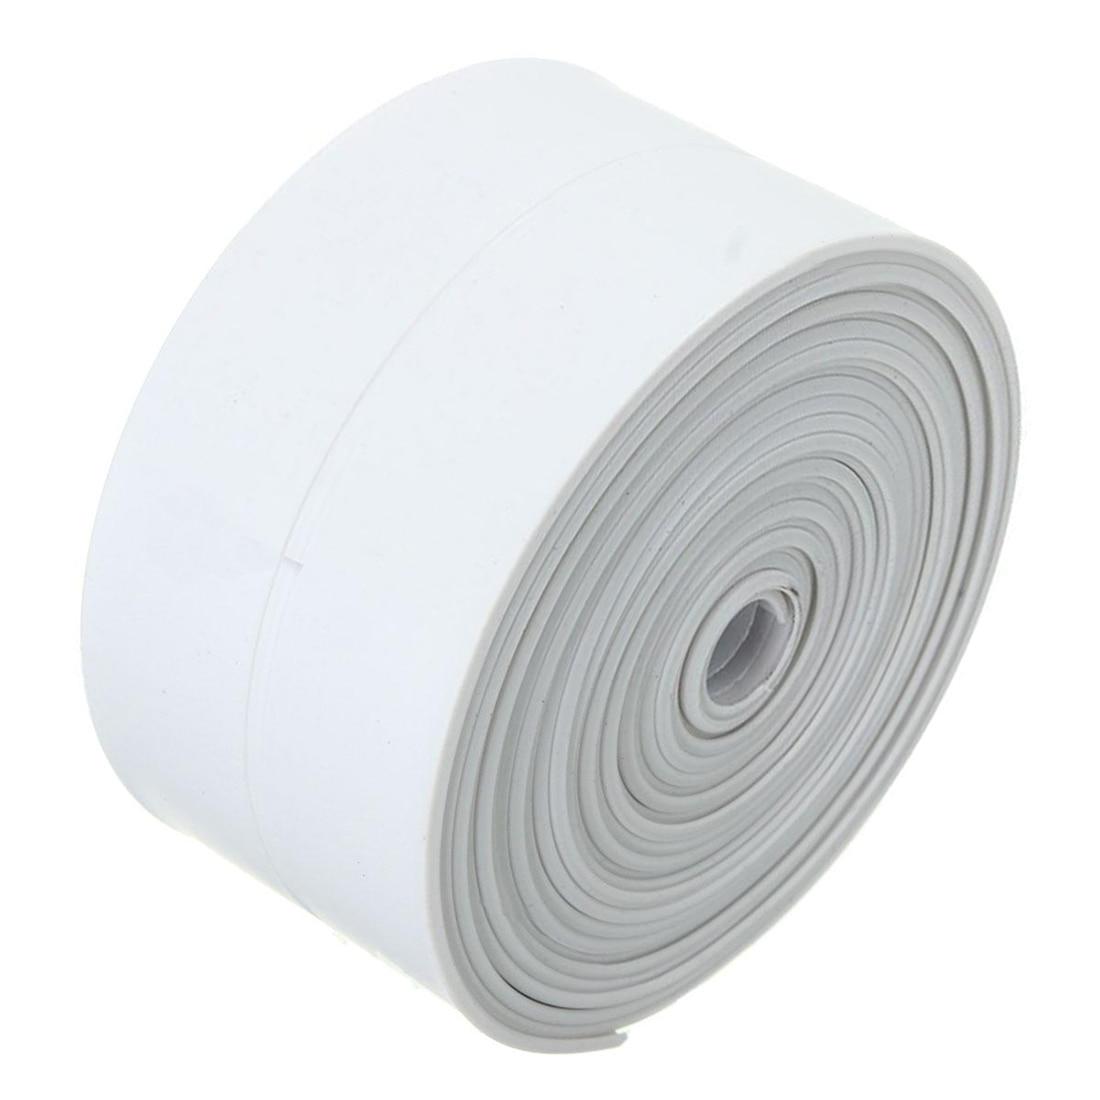 New 3.2m*38mm White Bath And Wall Sealing Strip Self Adhesive Tape Sink Basin Edge